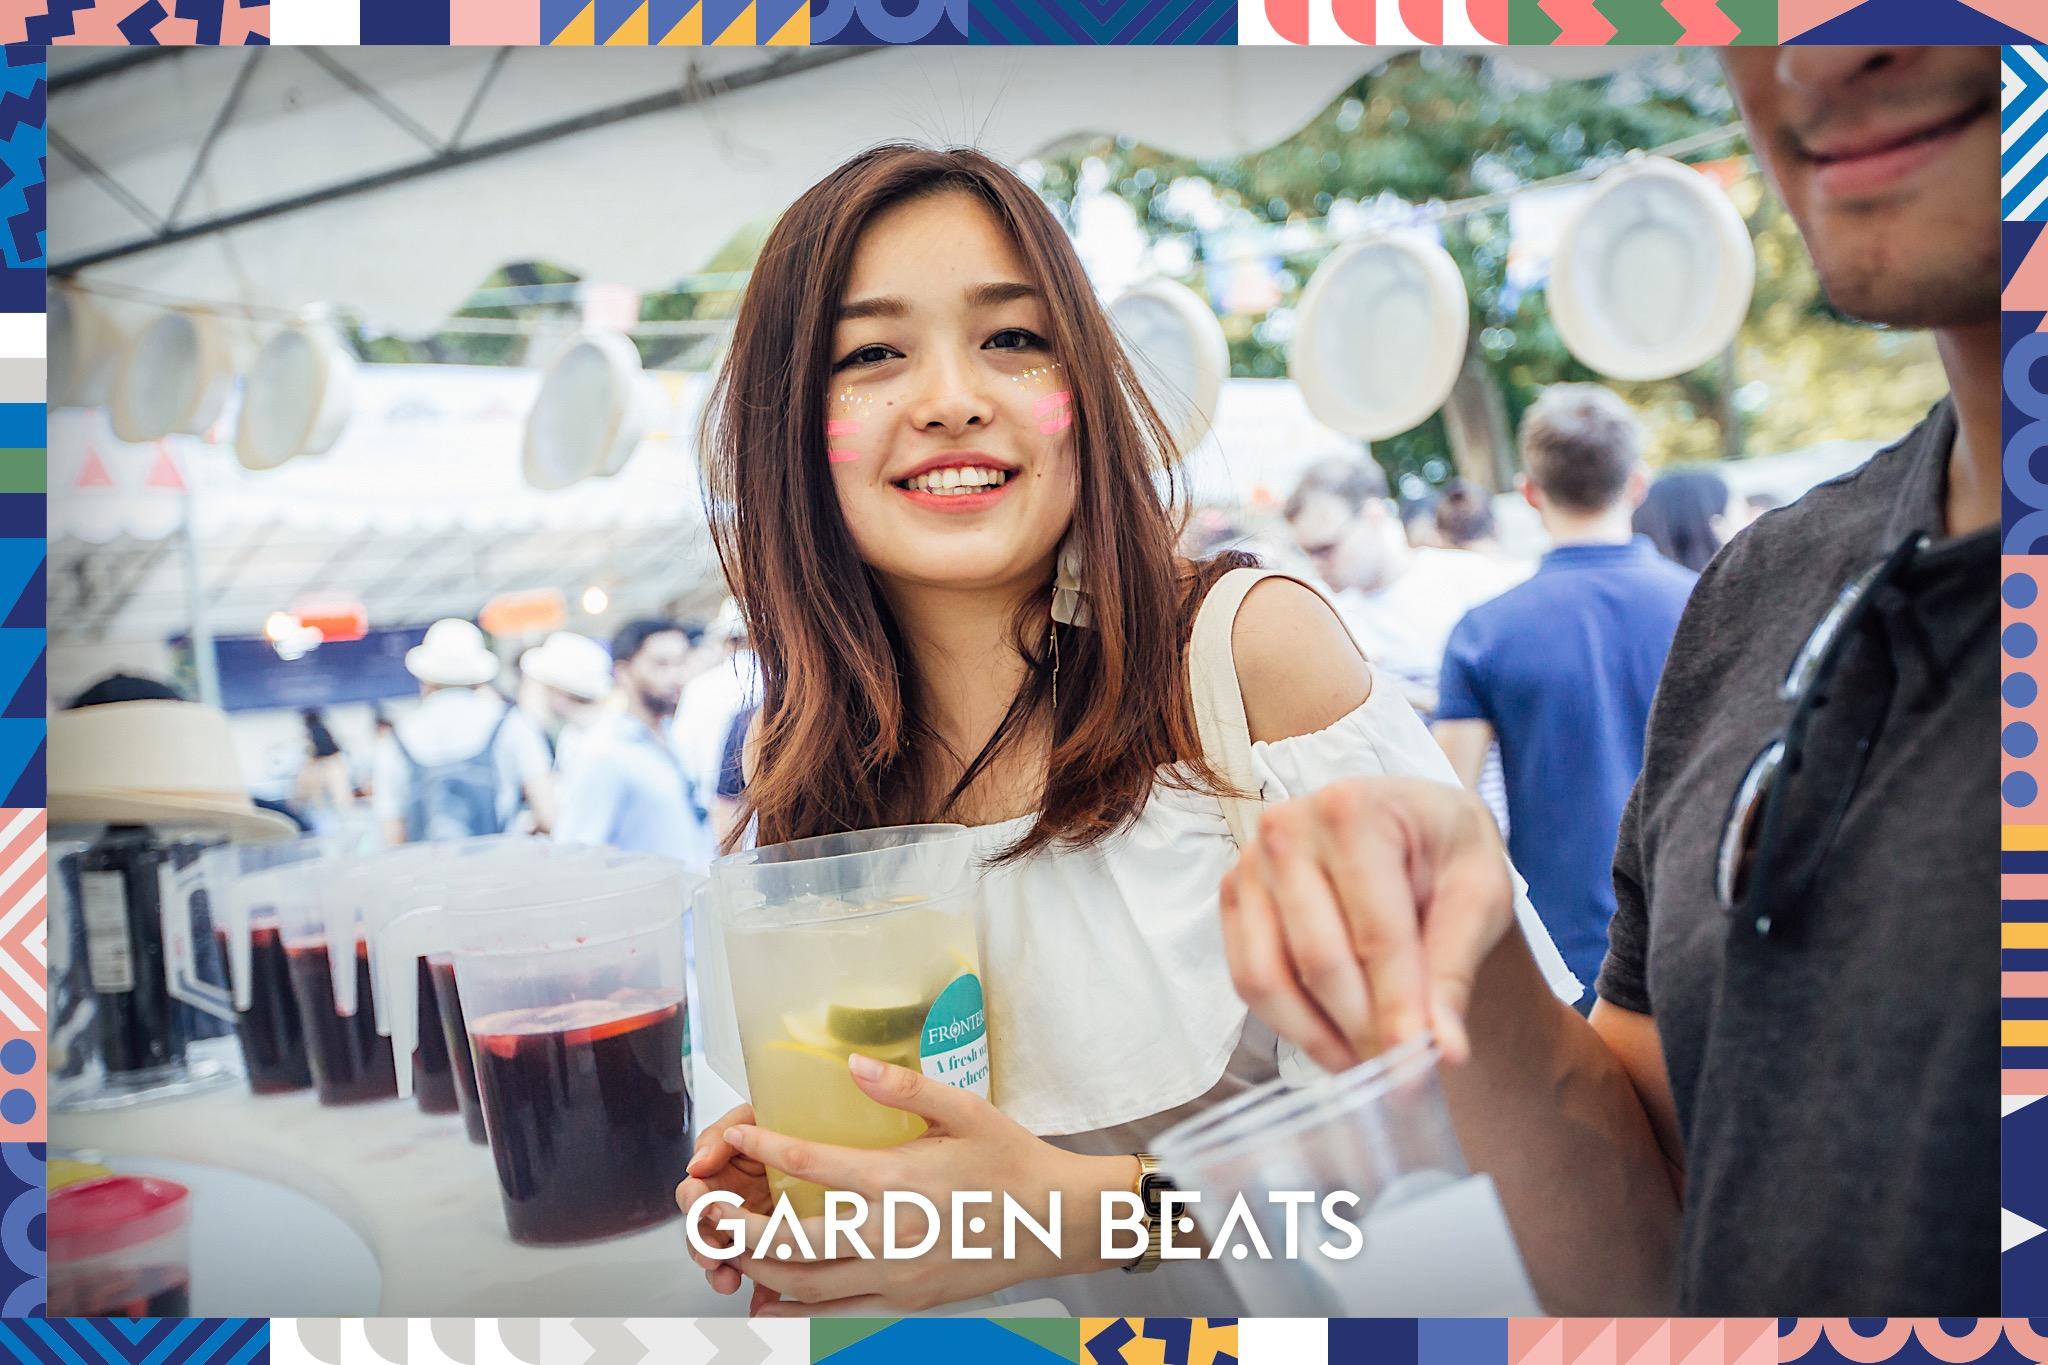 18032017_GardenBeats_Colossal537_WatermarkedGB.jpg